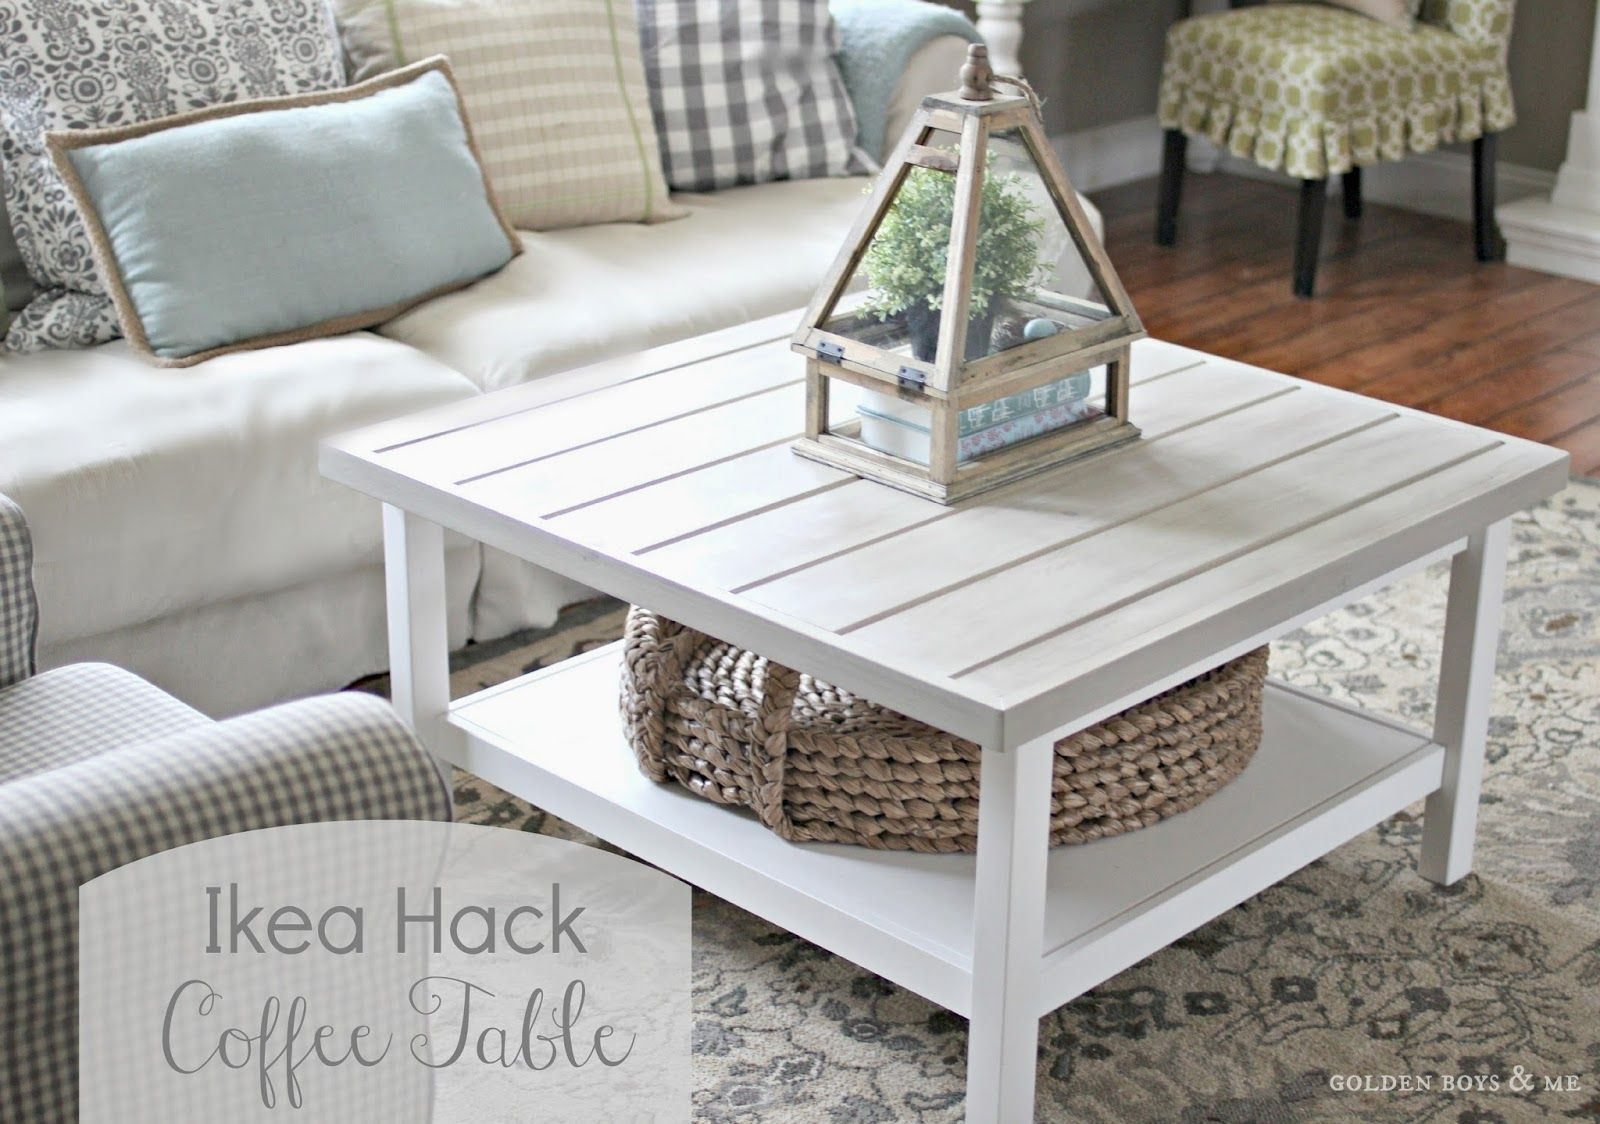 Coffee Table (Ikea Hack) Ikea hemnes coffee table, Ikea